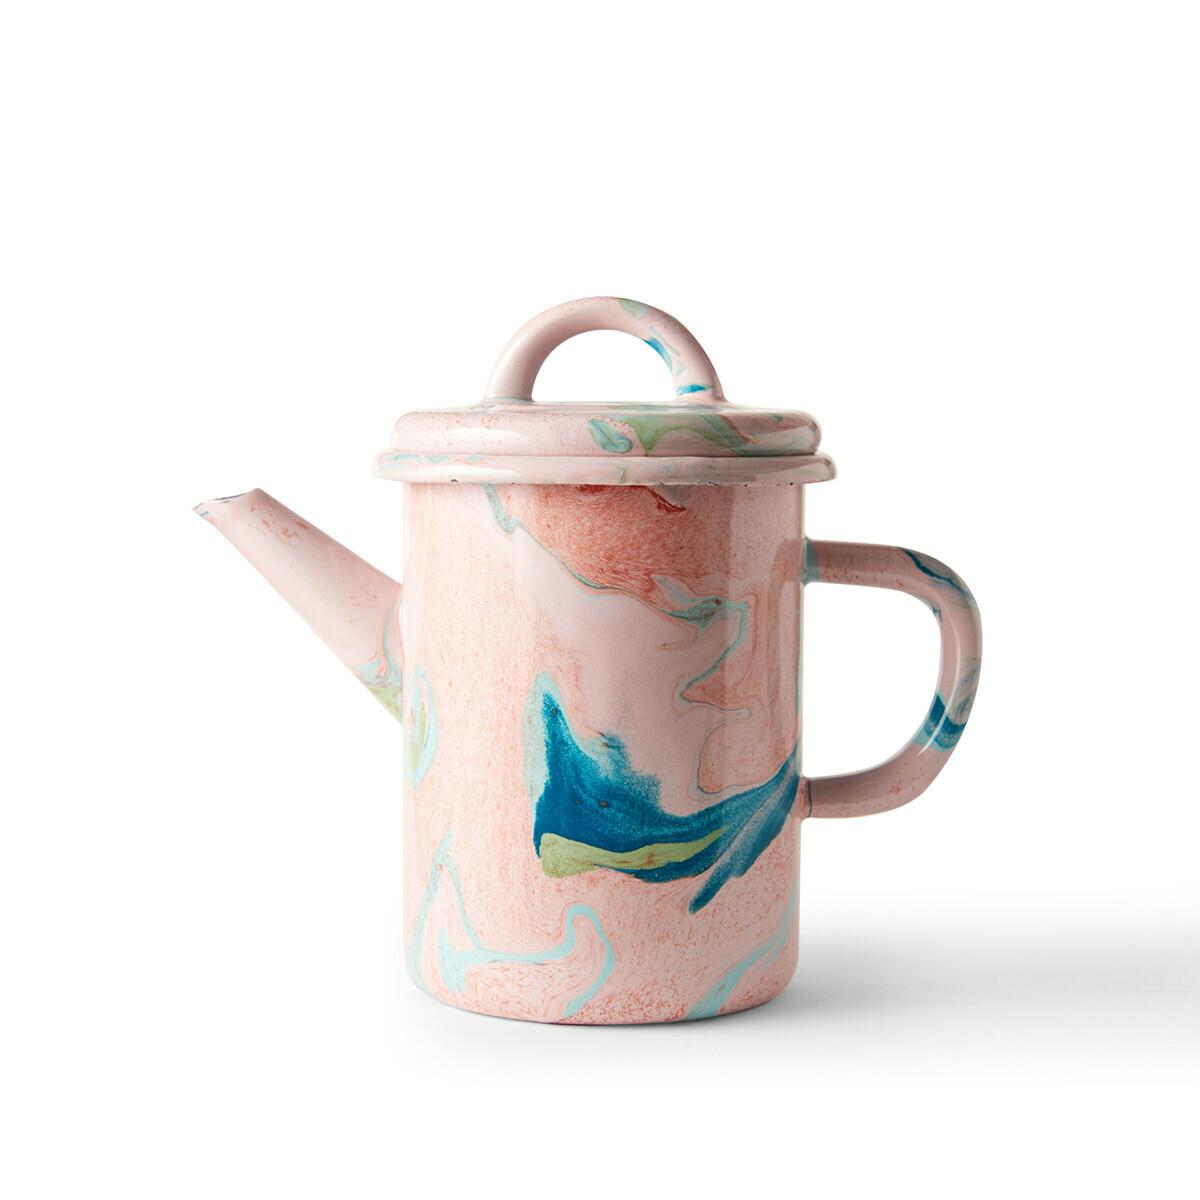 Enamelware Tea Pot 600ml - Blush Marble